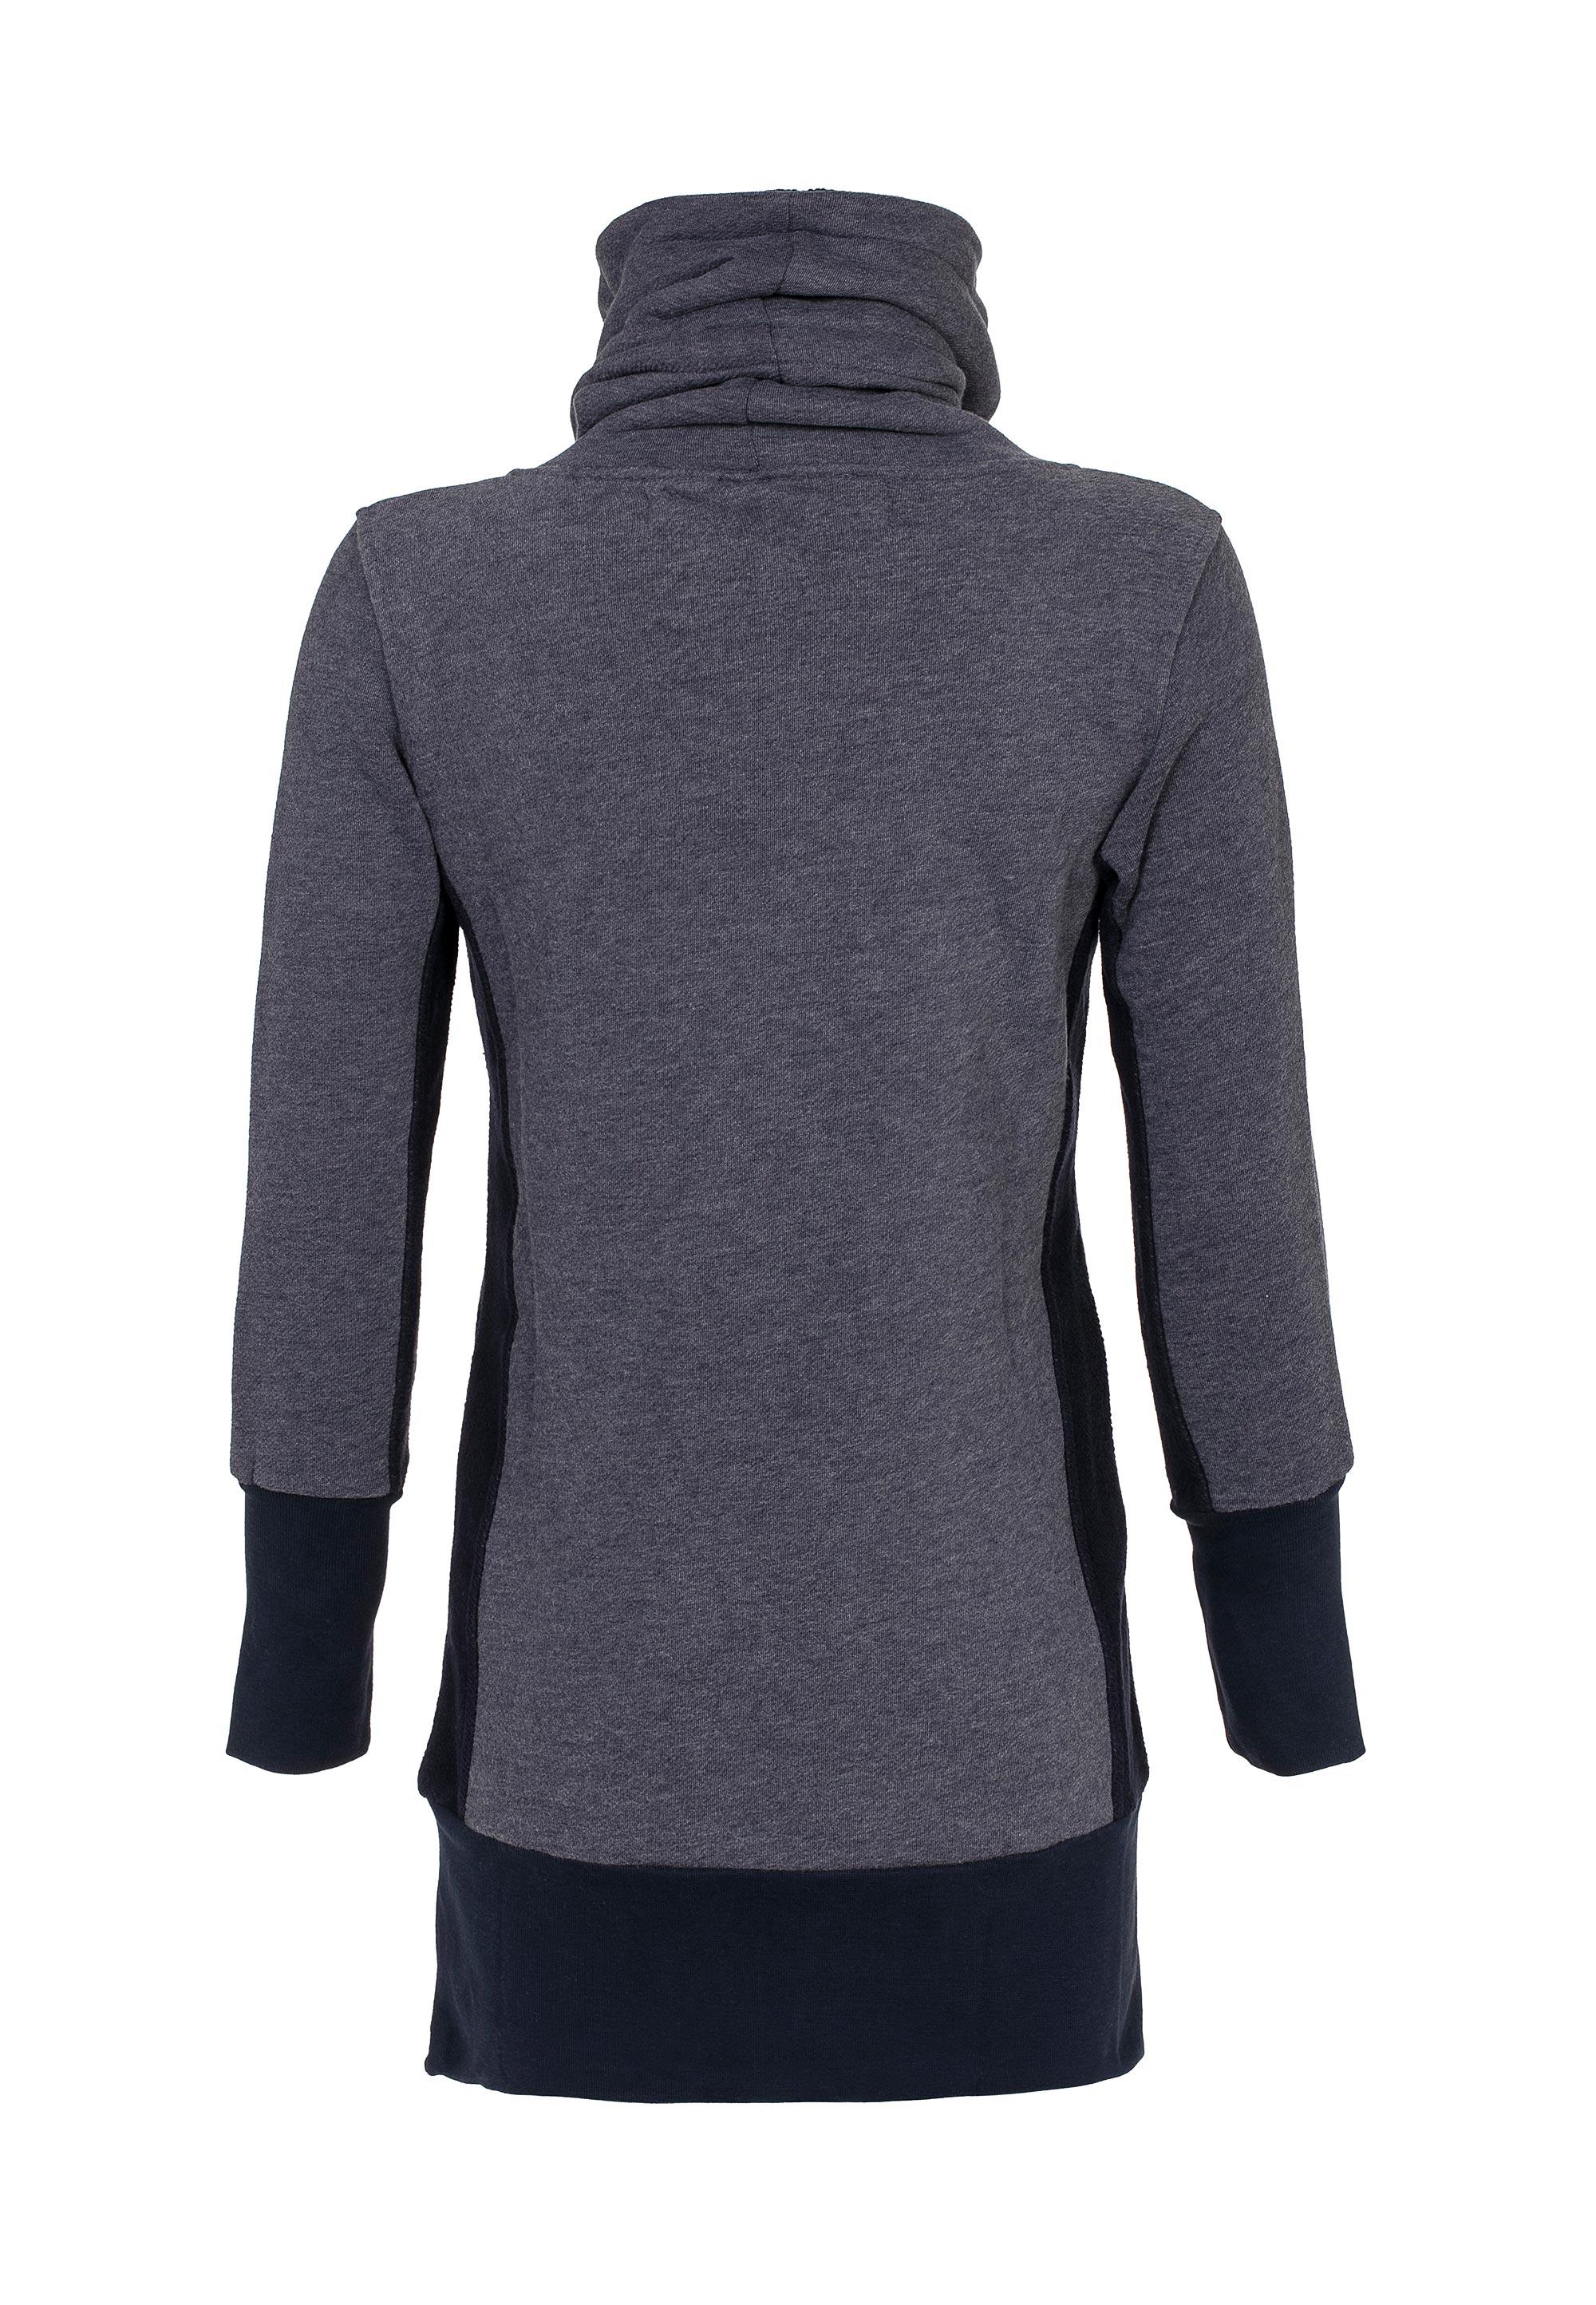 Cipo & Baxx Longsweatshirt Intra in Indigo günstig kaufen